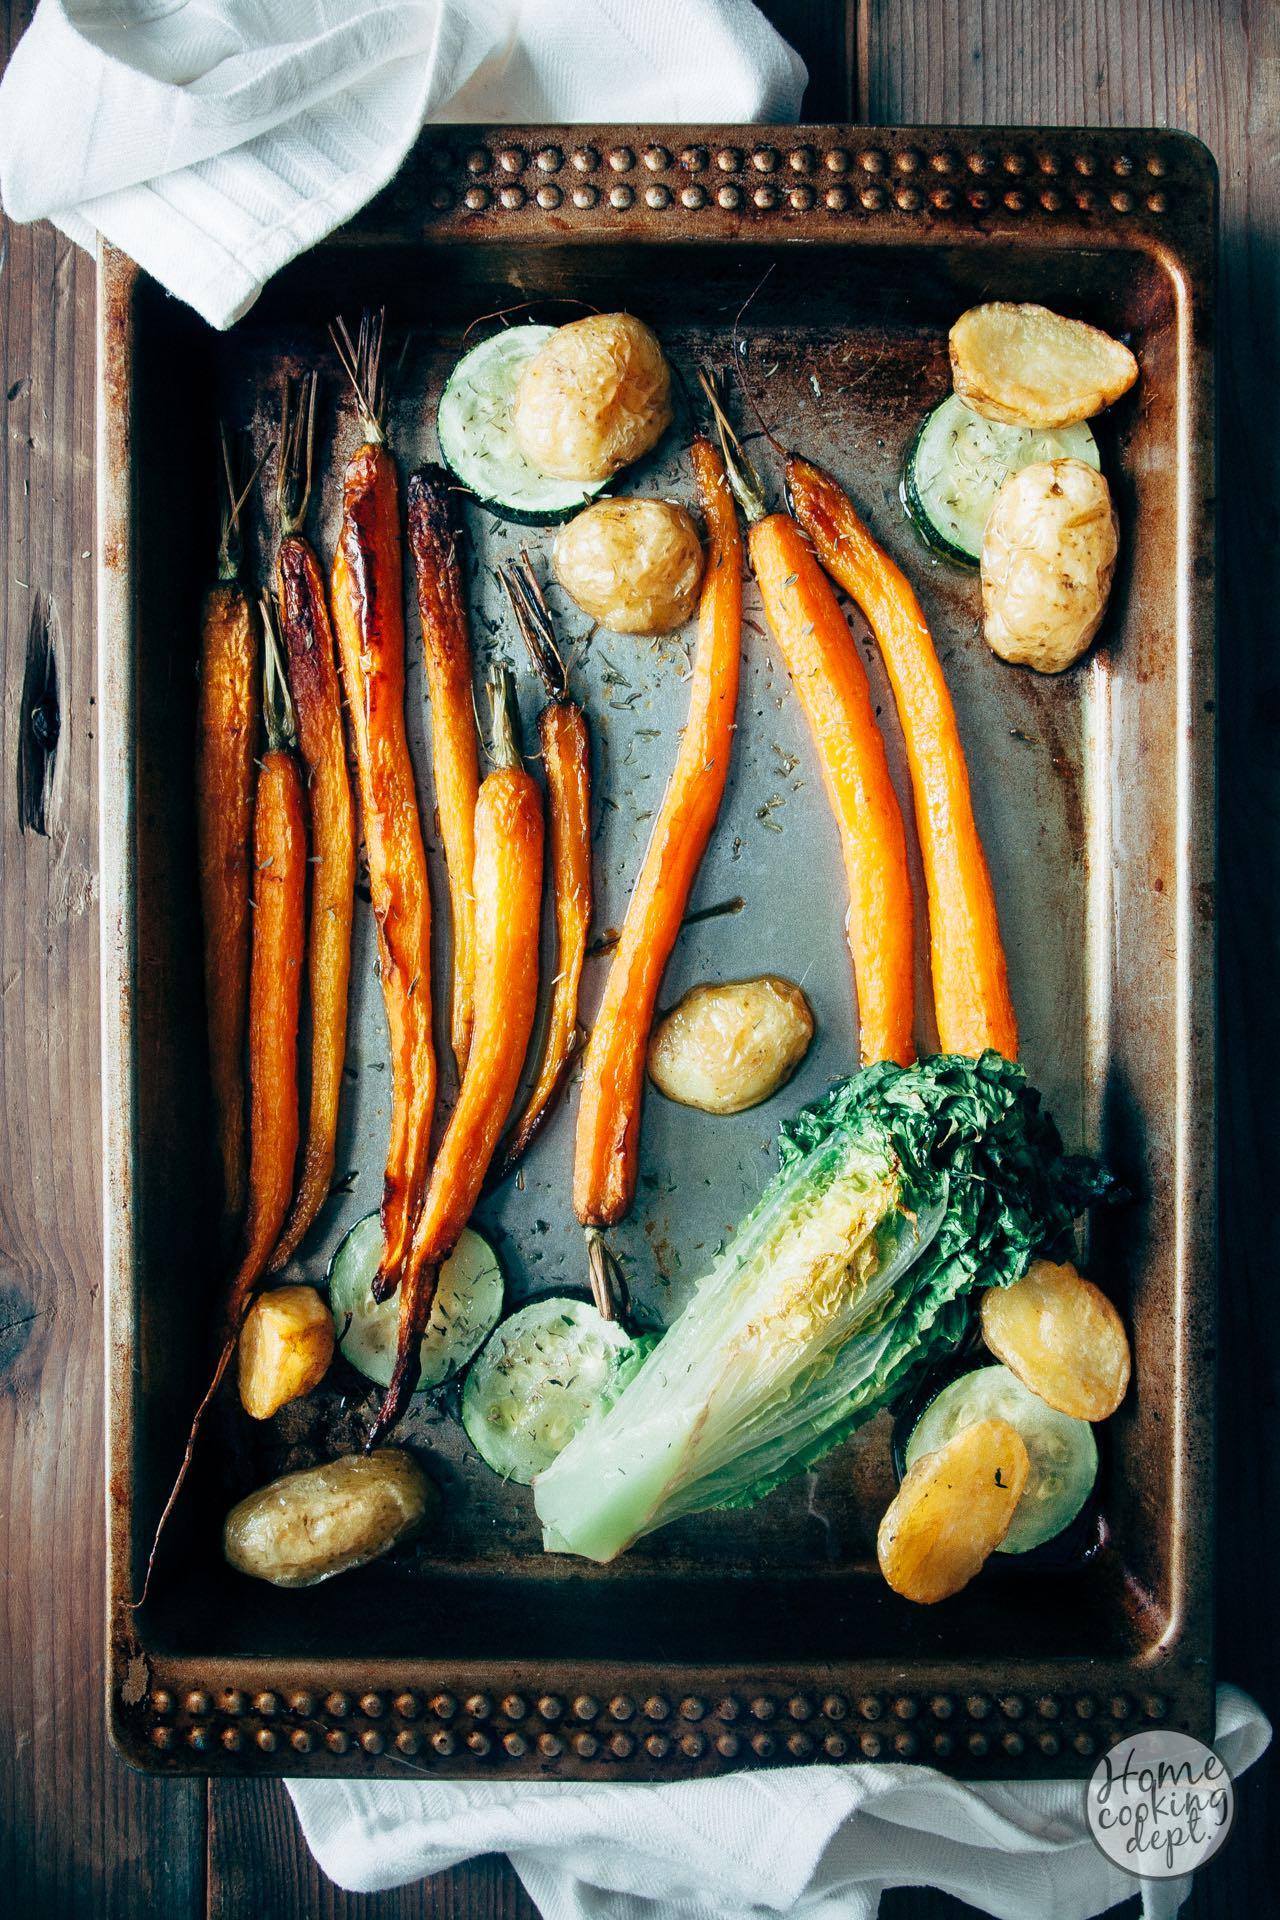 franse-groenteschotel-met-kip-0265.jpg